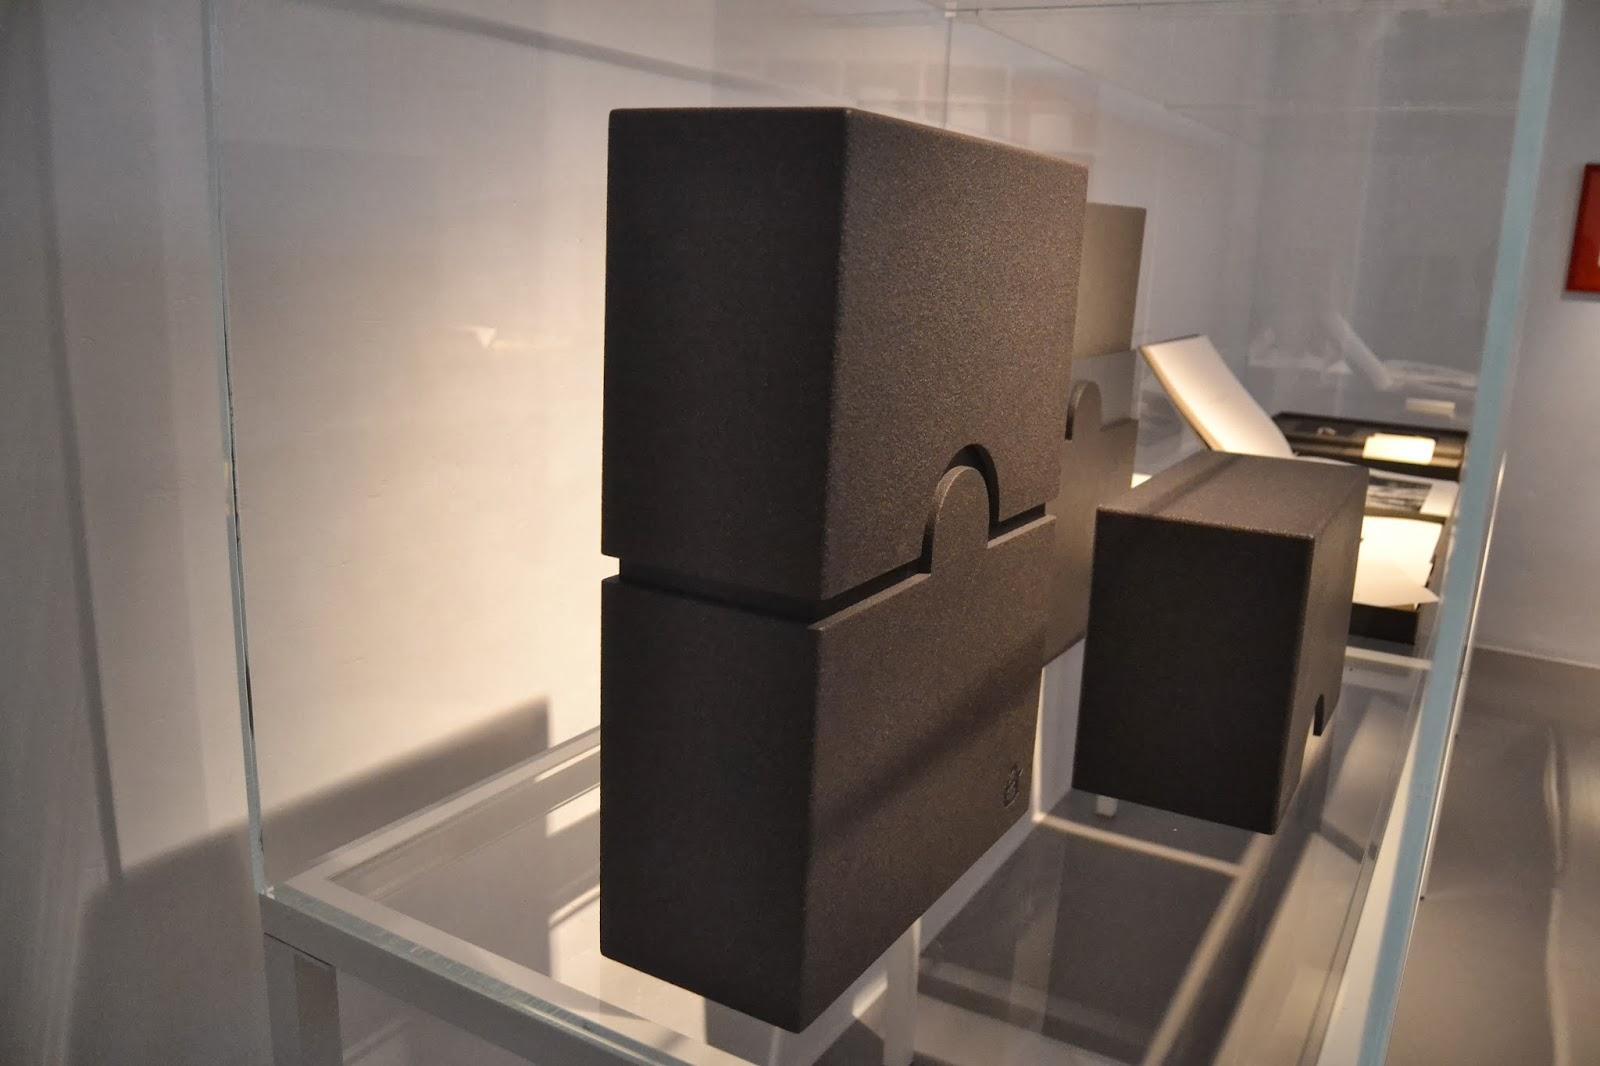 Retracing The Art Of Antoni Tàpies, From Surrealism To Pop Art